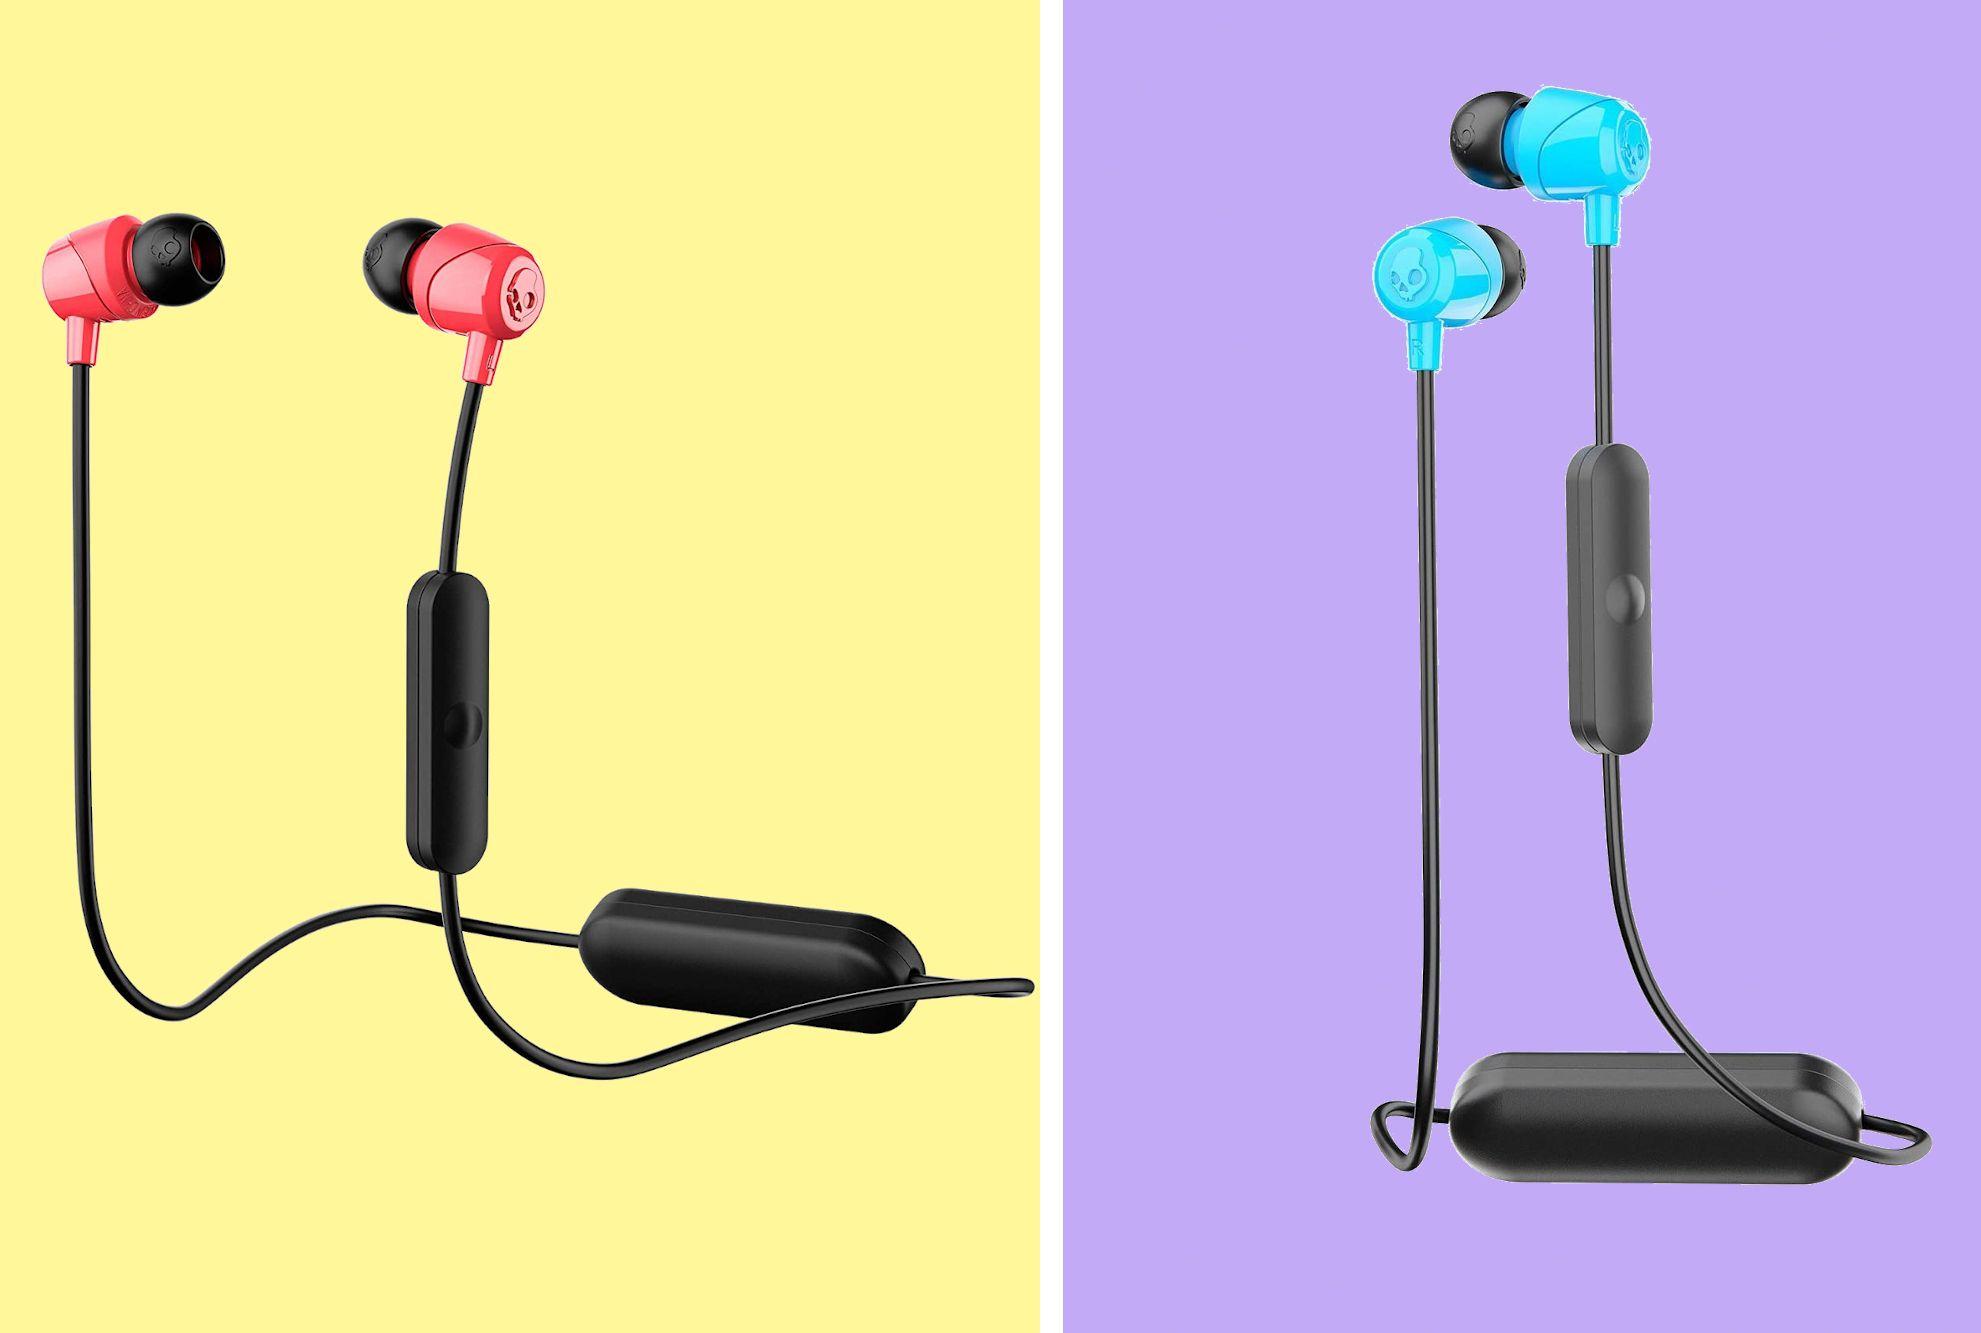 Skullcandy Wireless Earbuds Mental Floss